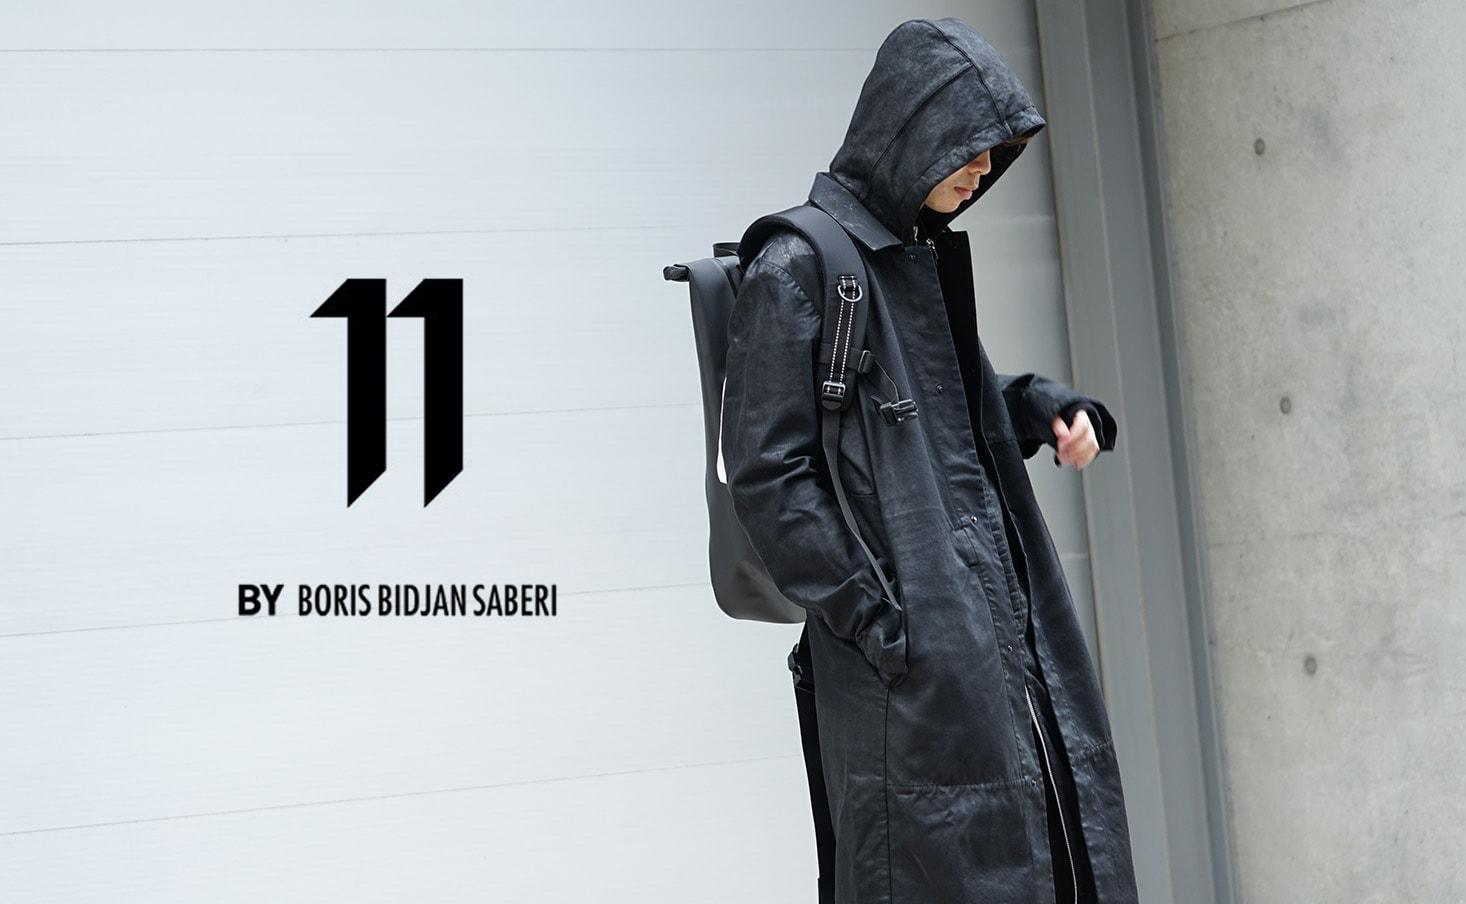 11 BY BORIS BIDJAN SABERI 18-19 aw collection